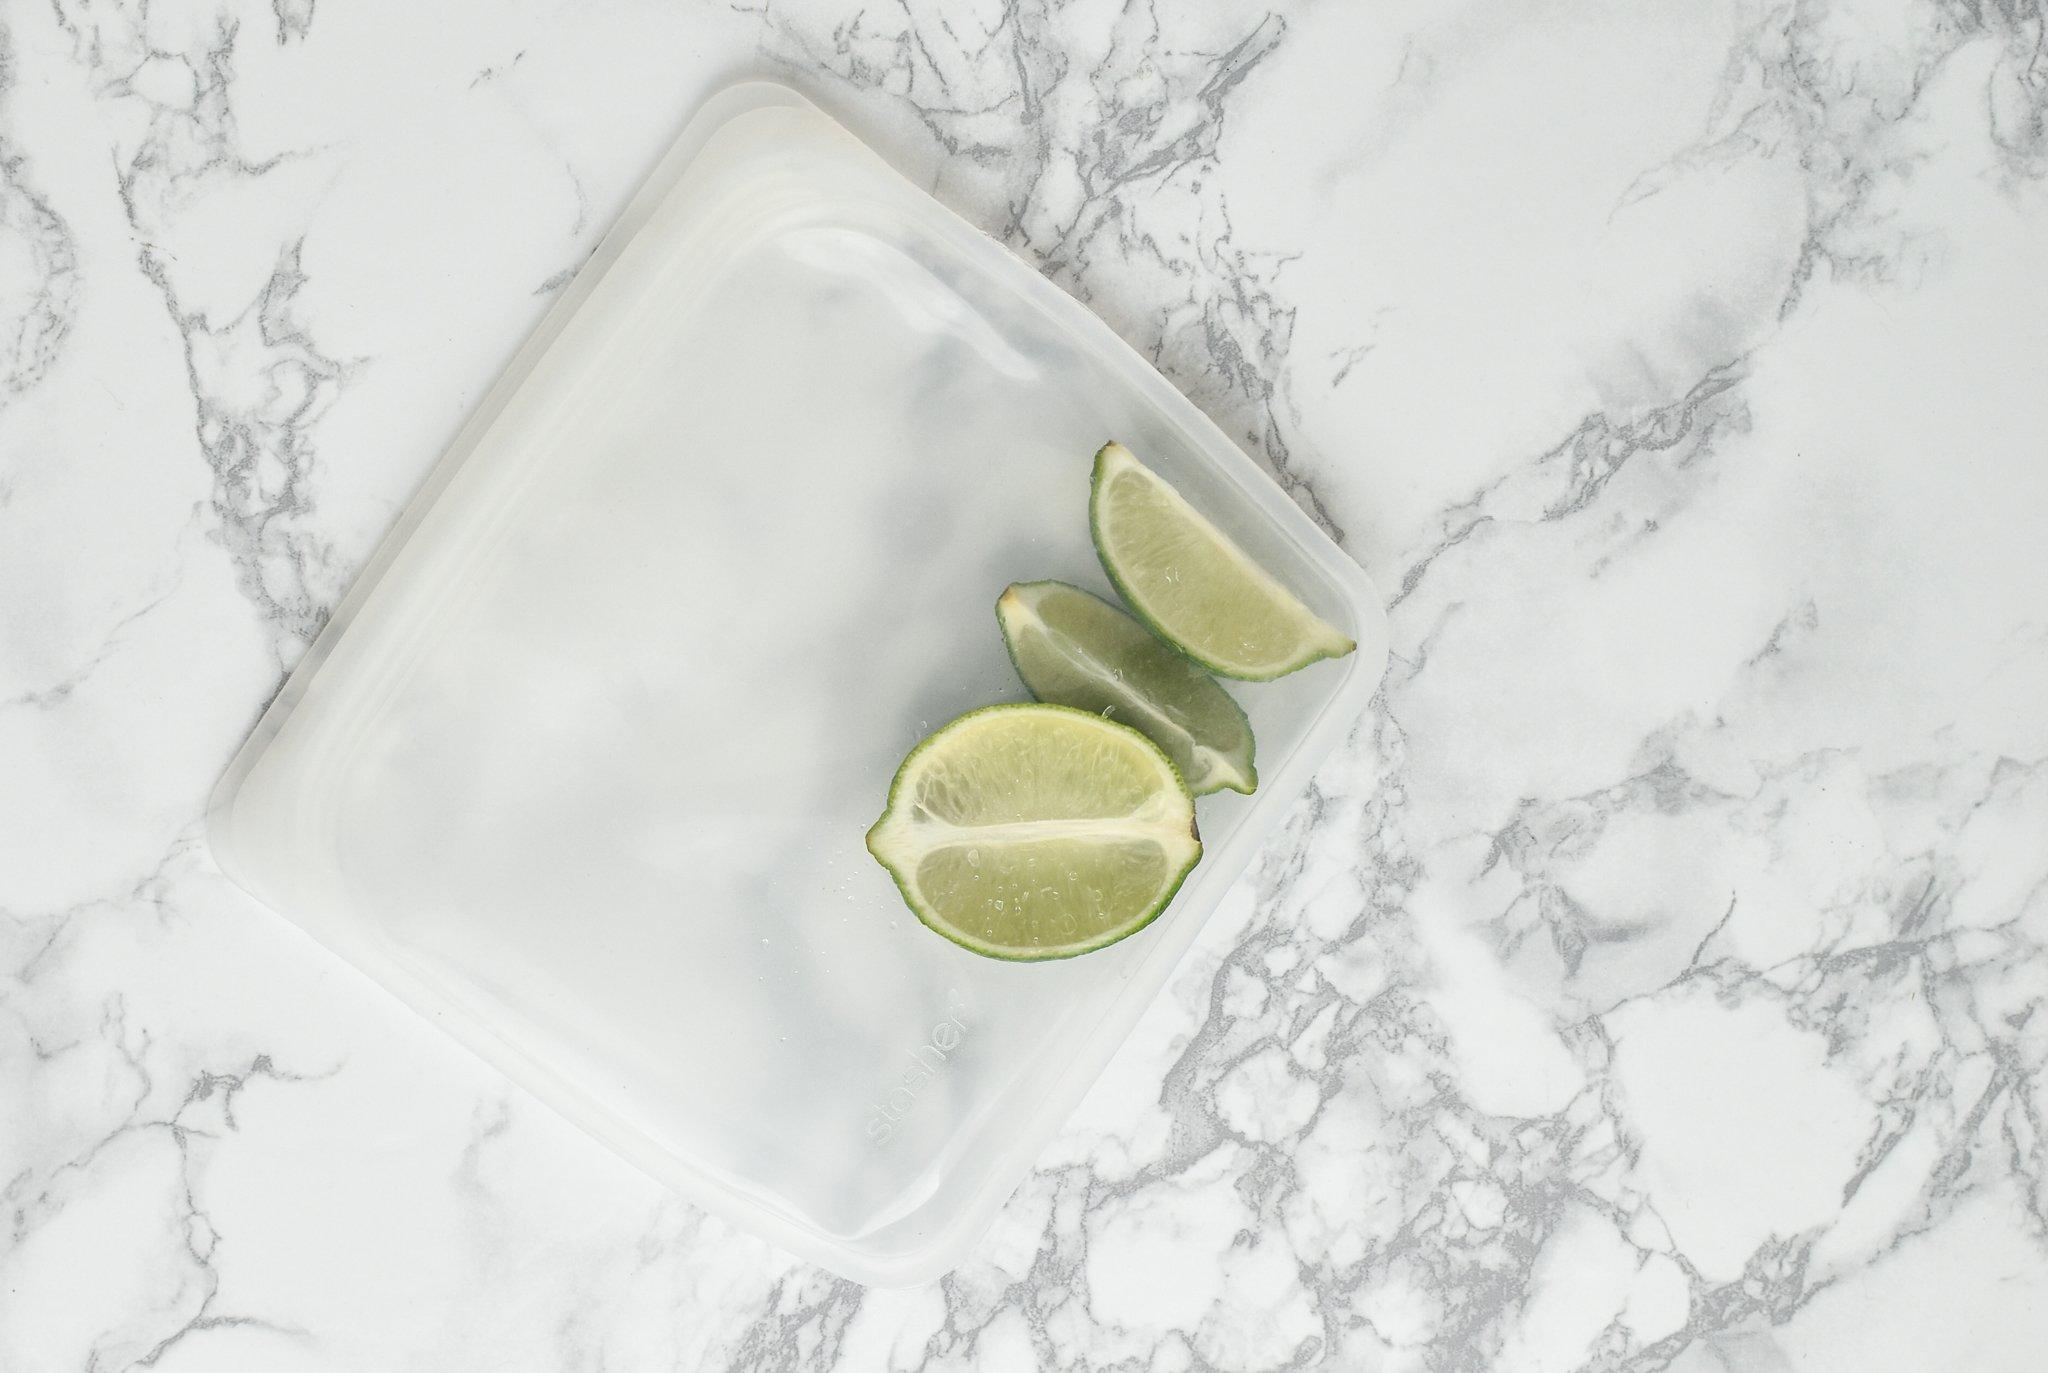 Stasher Reusable Silicone Food Bag Review